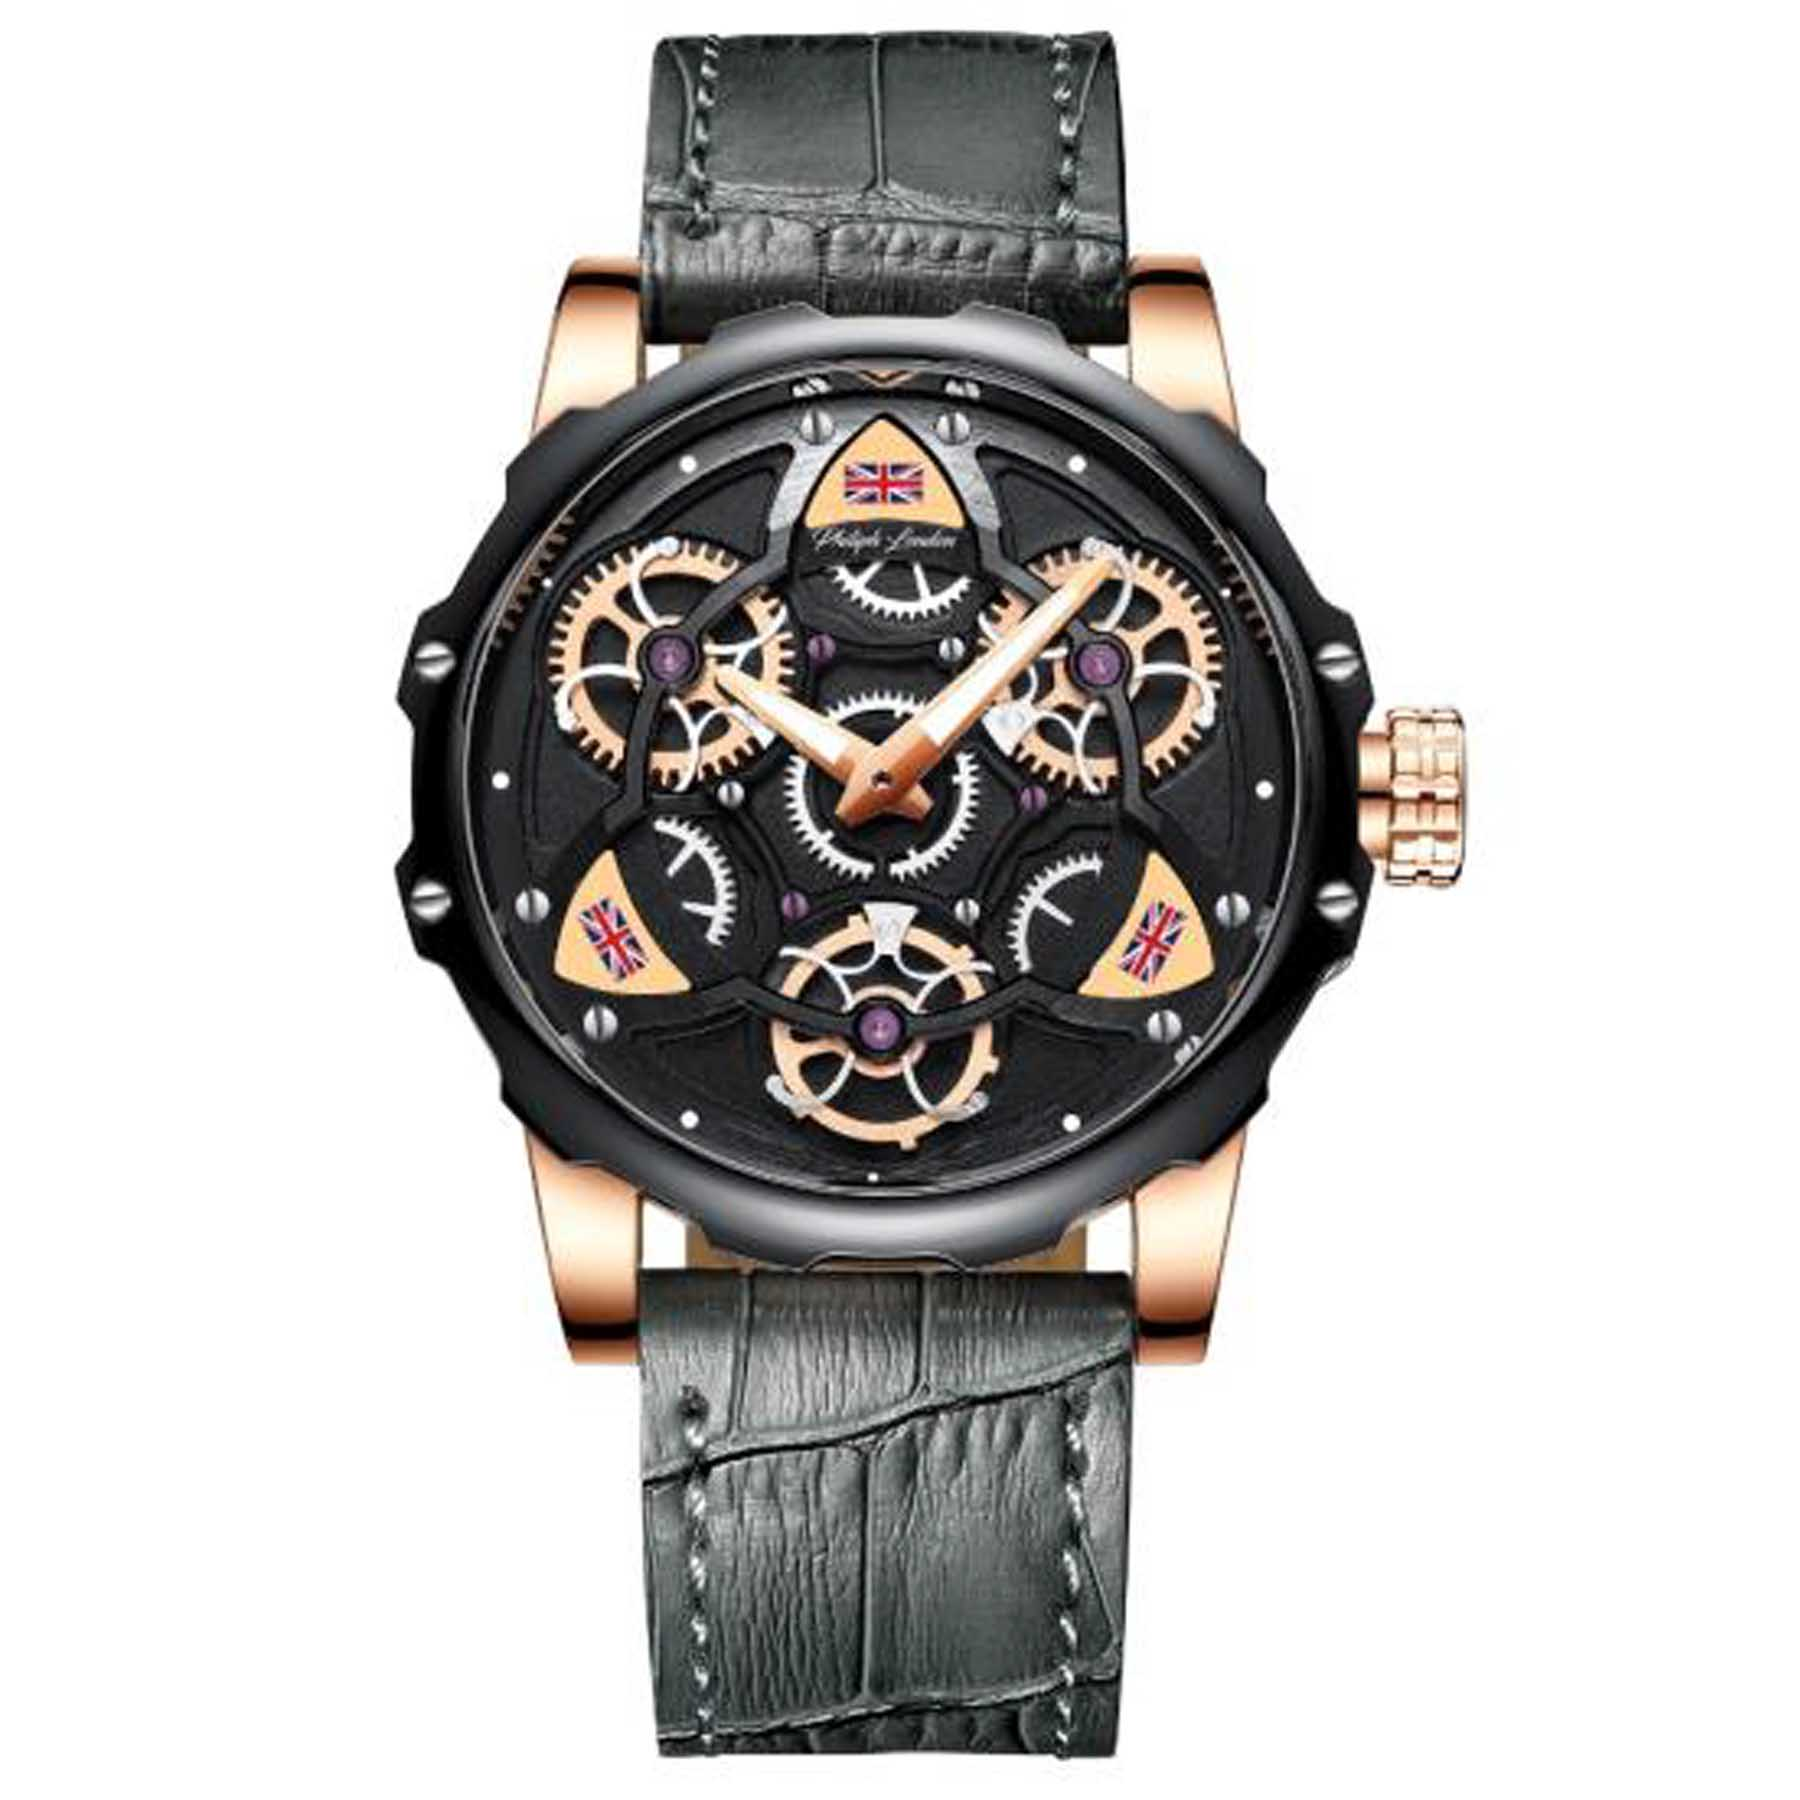 Relógio Philiph London Analógico Masculino PL80184112M